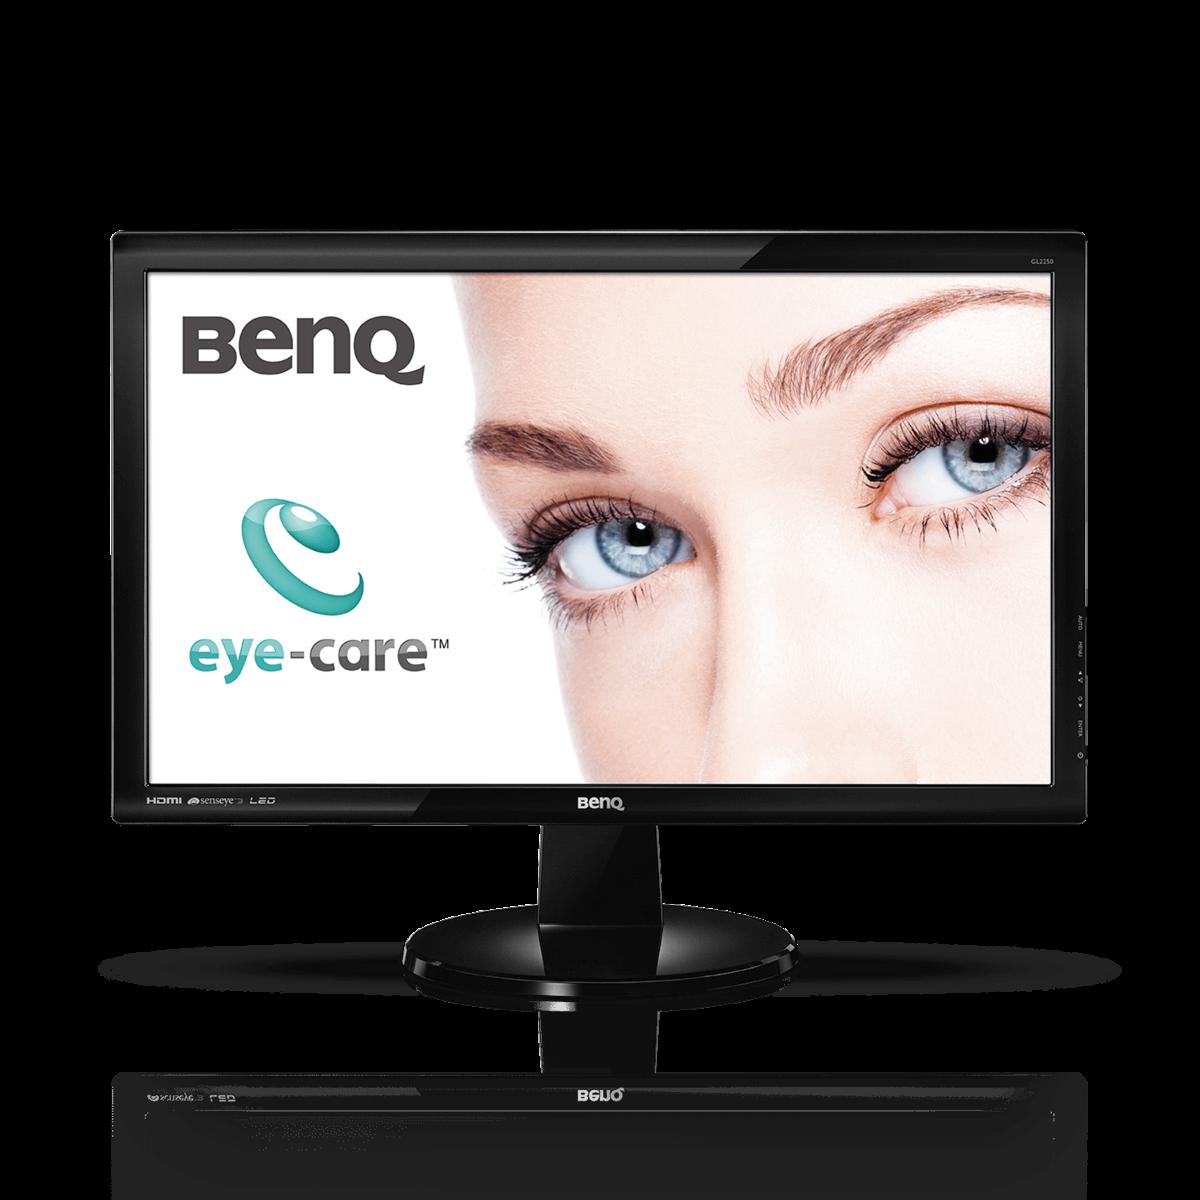 Compumail ApS - LED skærm - BenQ GL2250HM 21 5